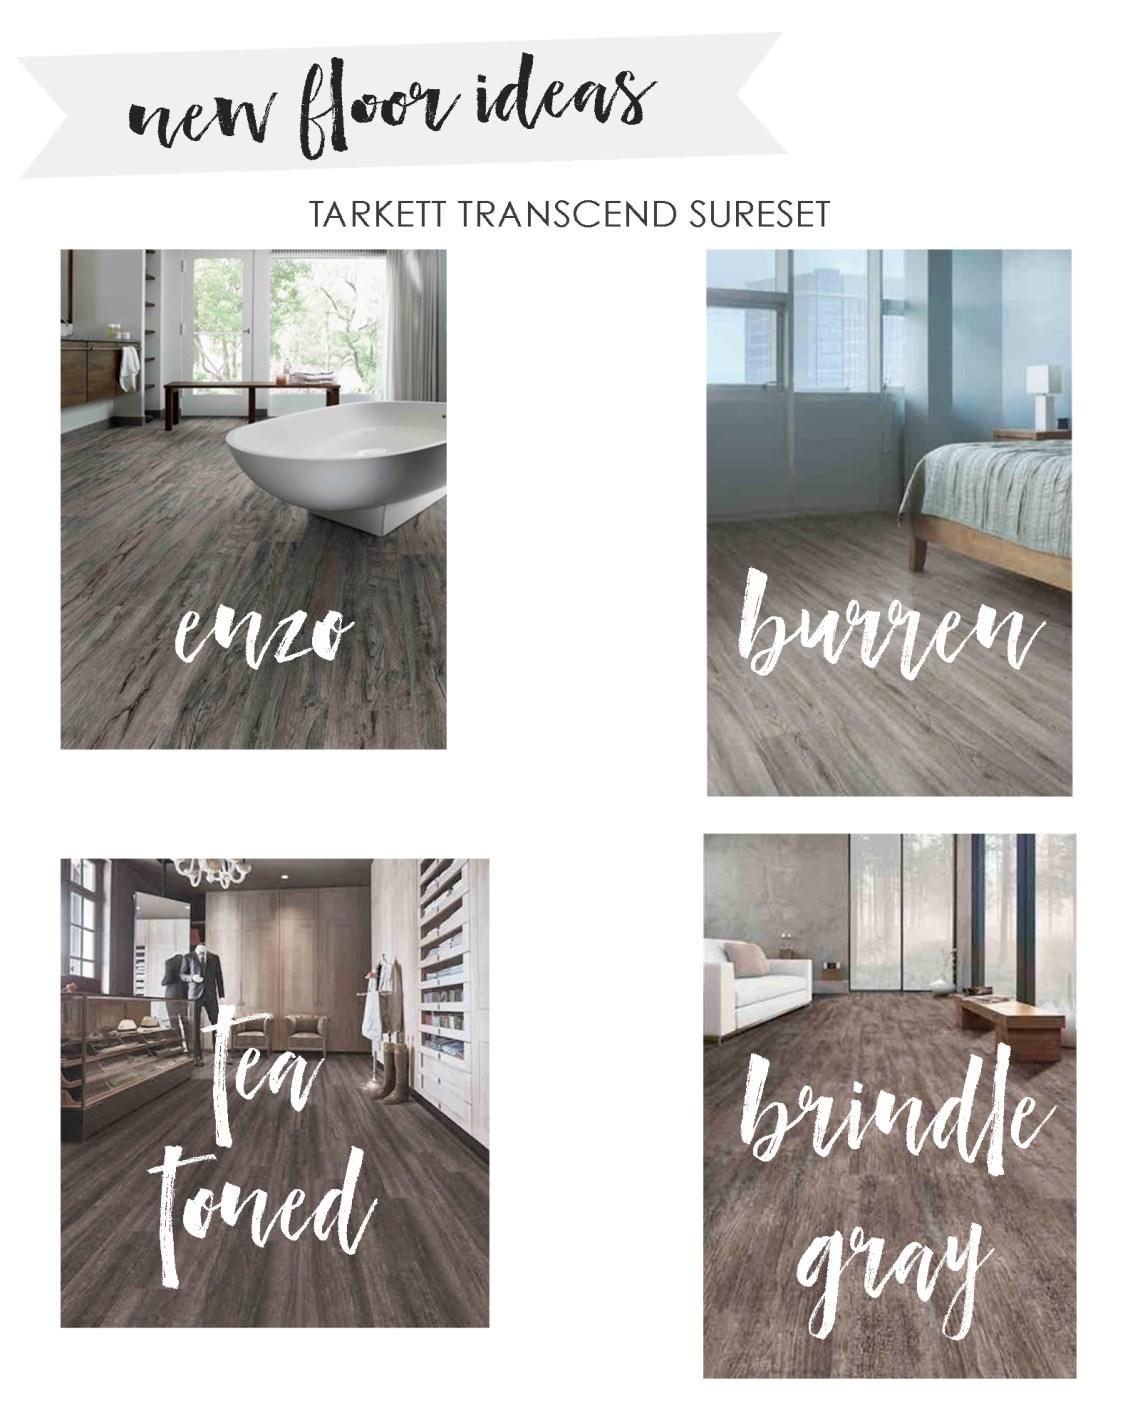 Vinyl Plank Flooring - New Flooring - Vinyl Flooring Wood Floors by Tarkett - Home Design via Misty Nelson frostedblog.com @frostedevents